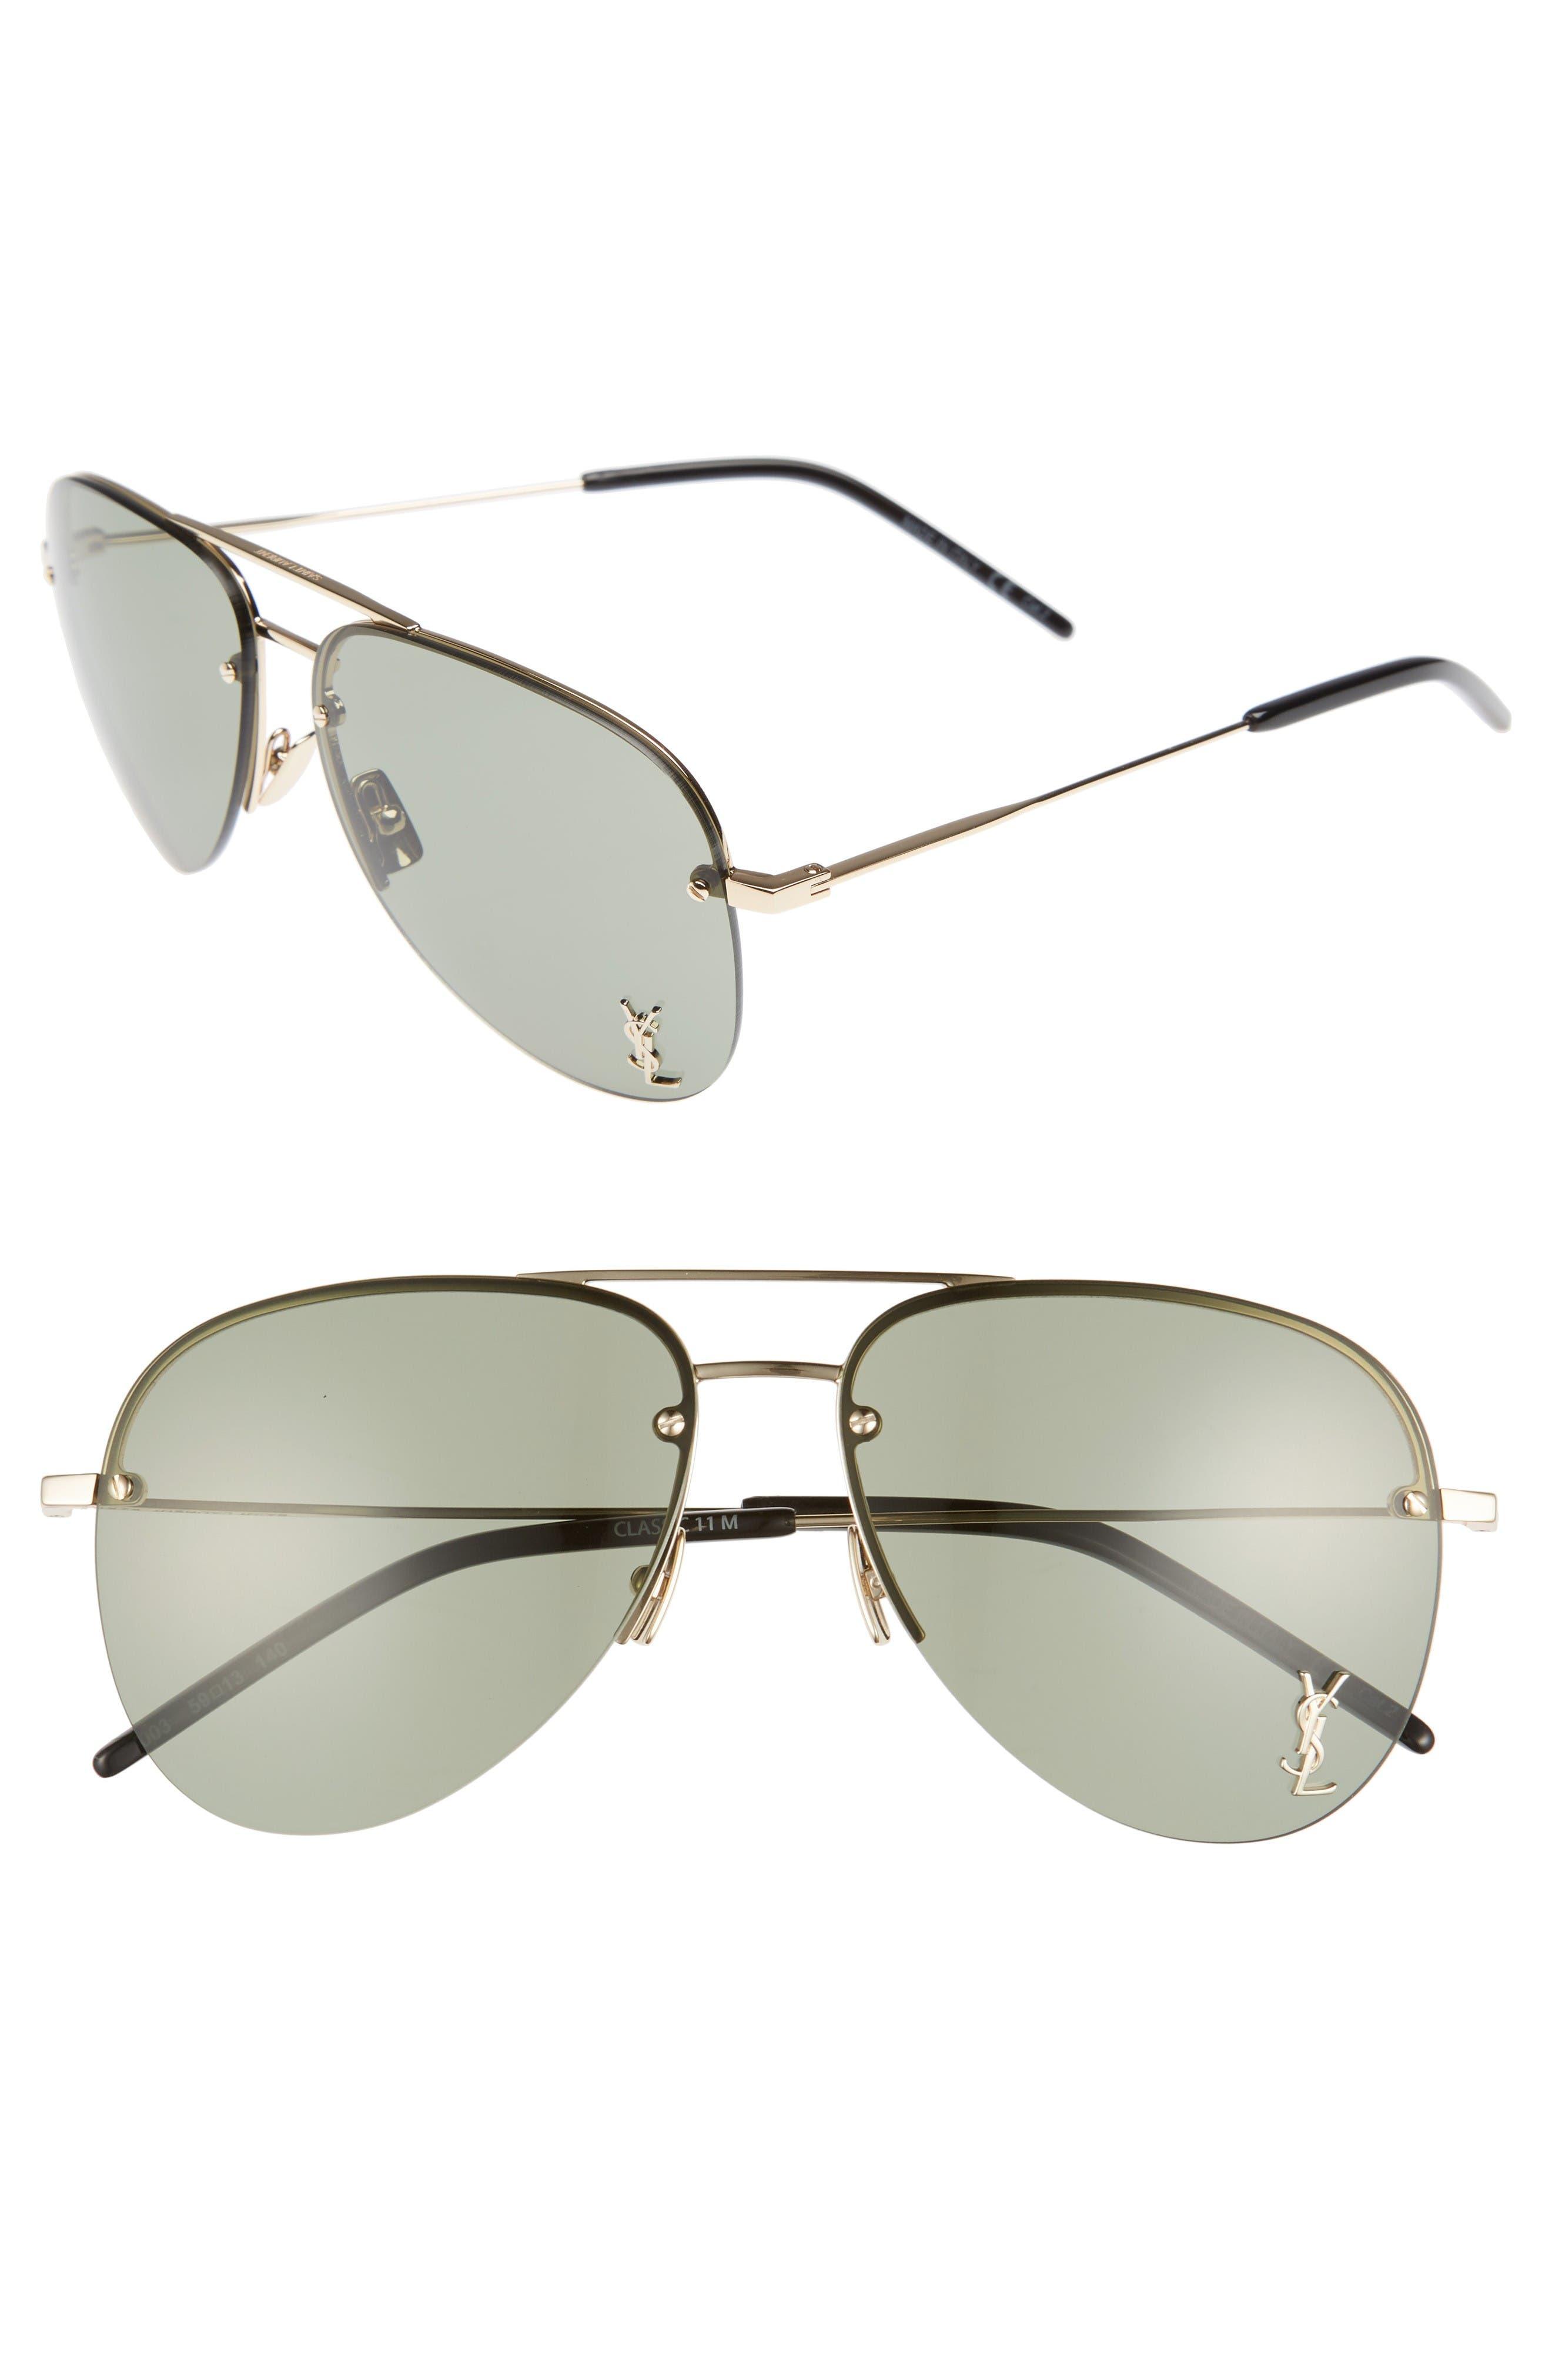 59mm Aviator Sunglasses,                             Main thumbnail 1, color,                             Gold